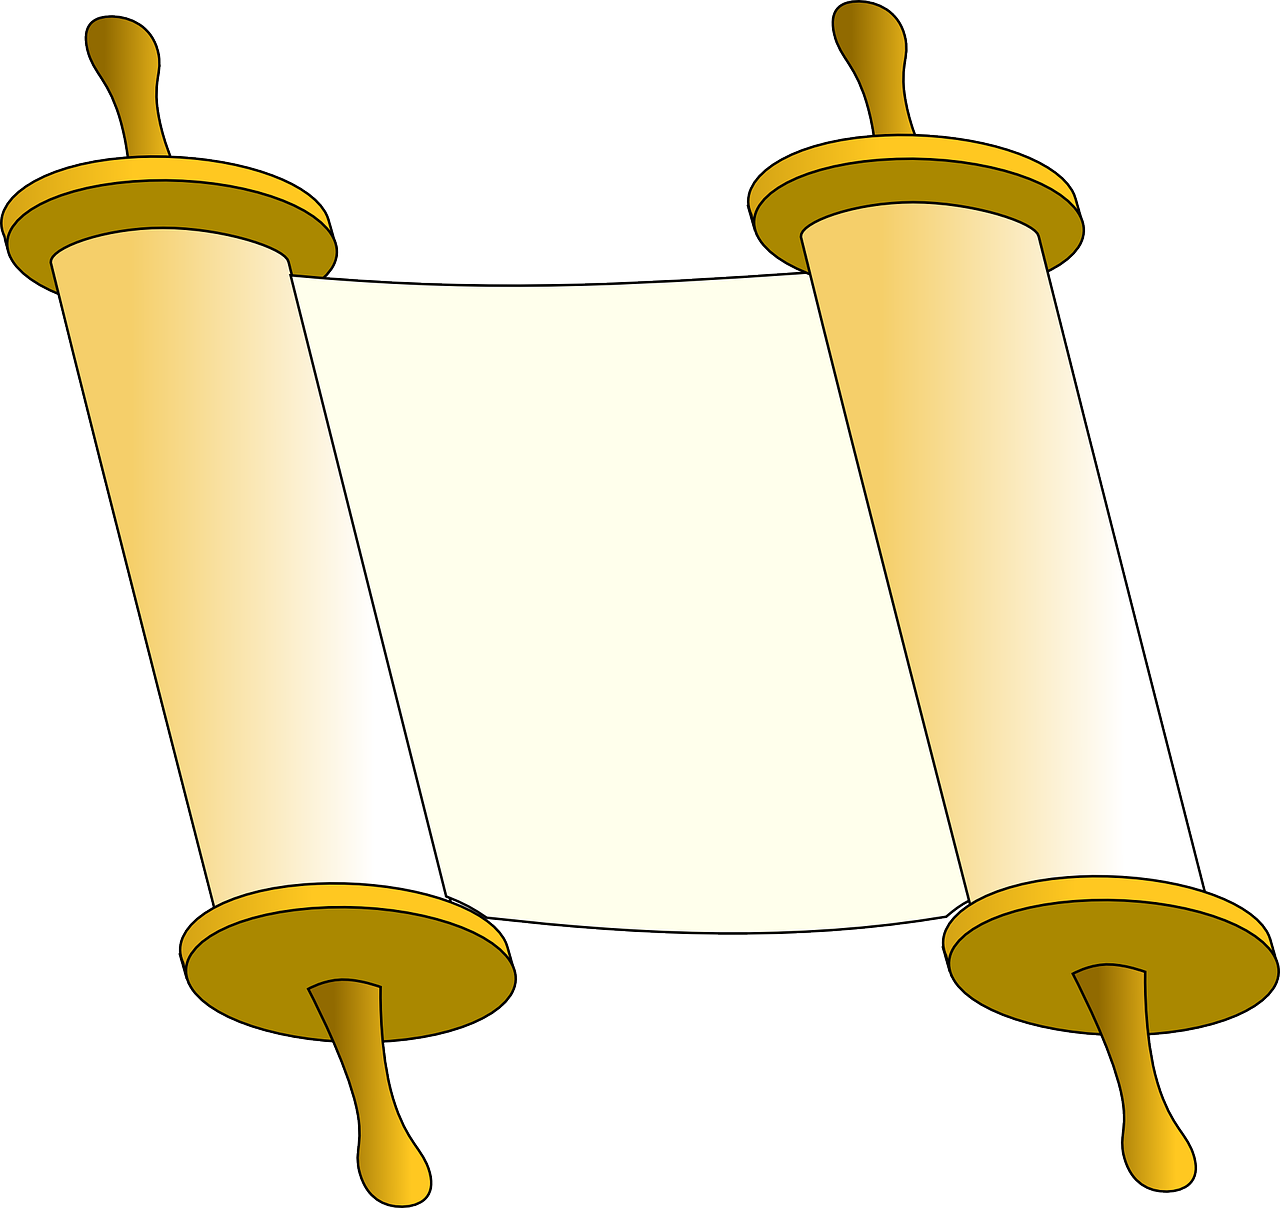 image library library Chessed ve emet s. Torah clipart ark.